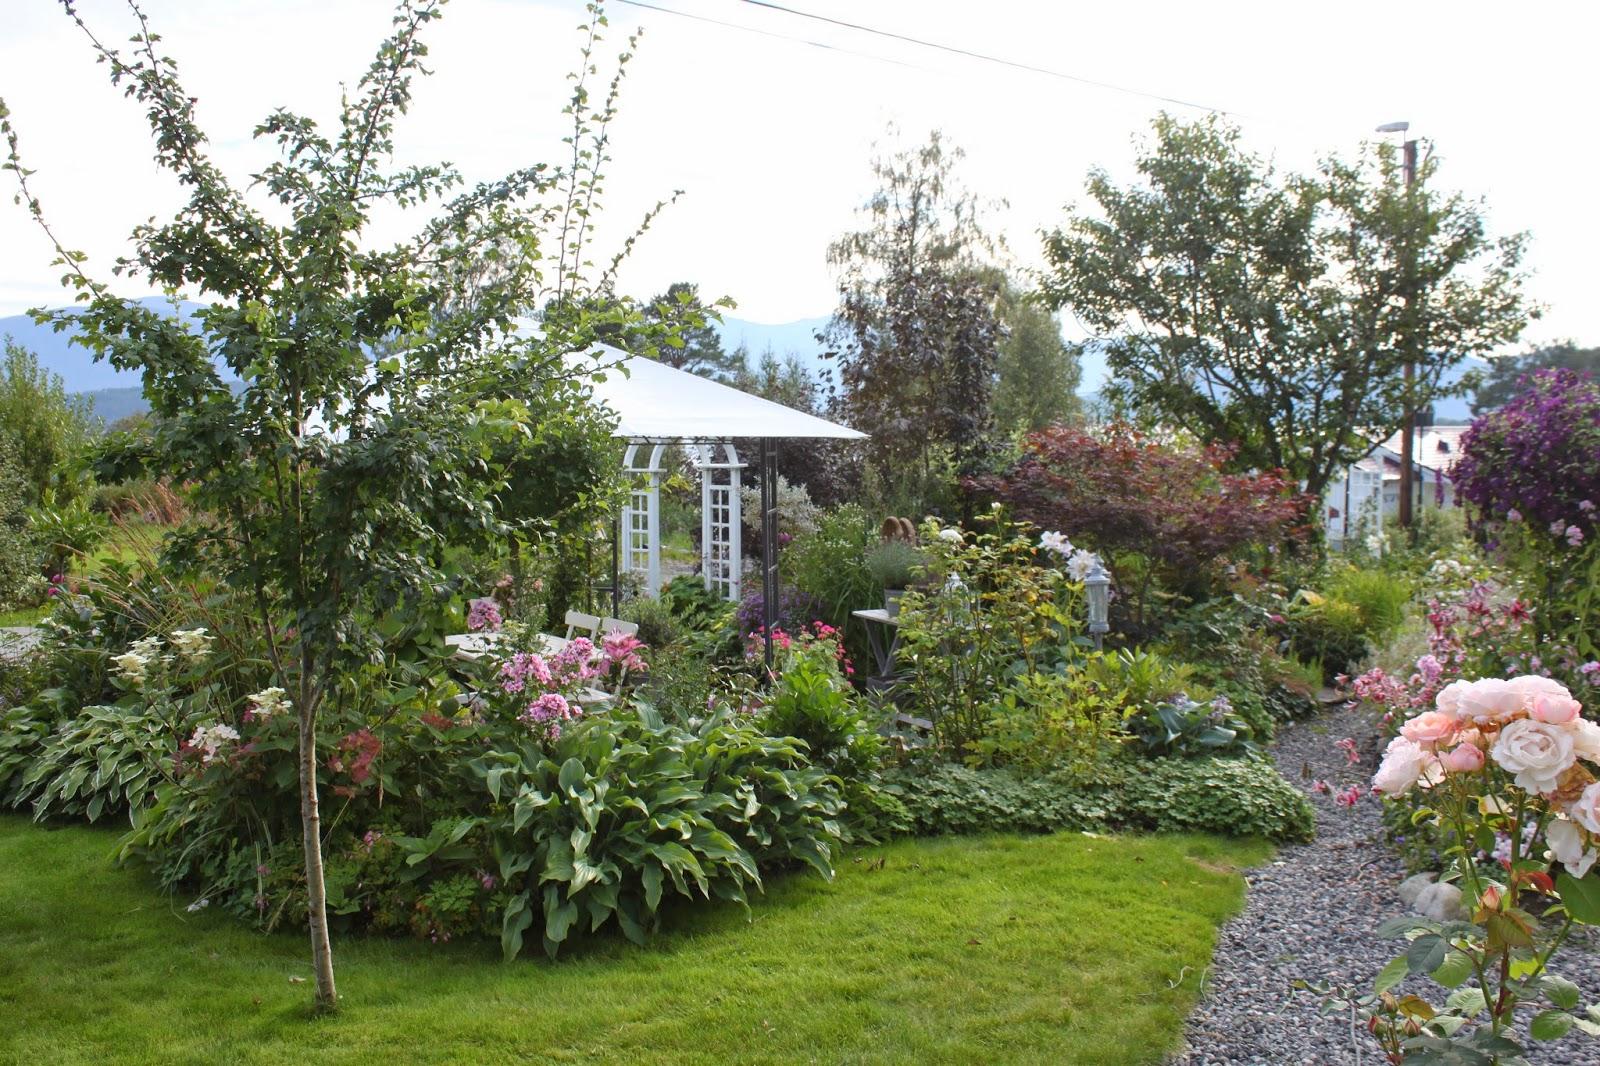 Nina i Paradiset: Mine m?-ha-planter i hagen del 1.